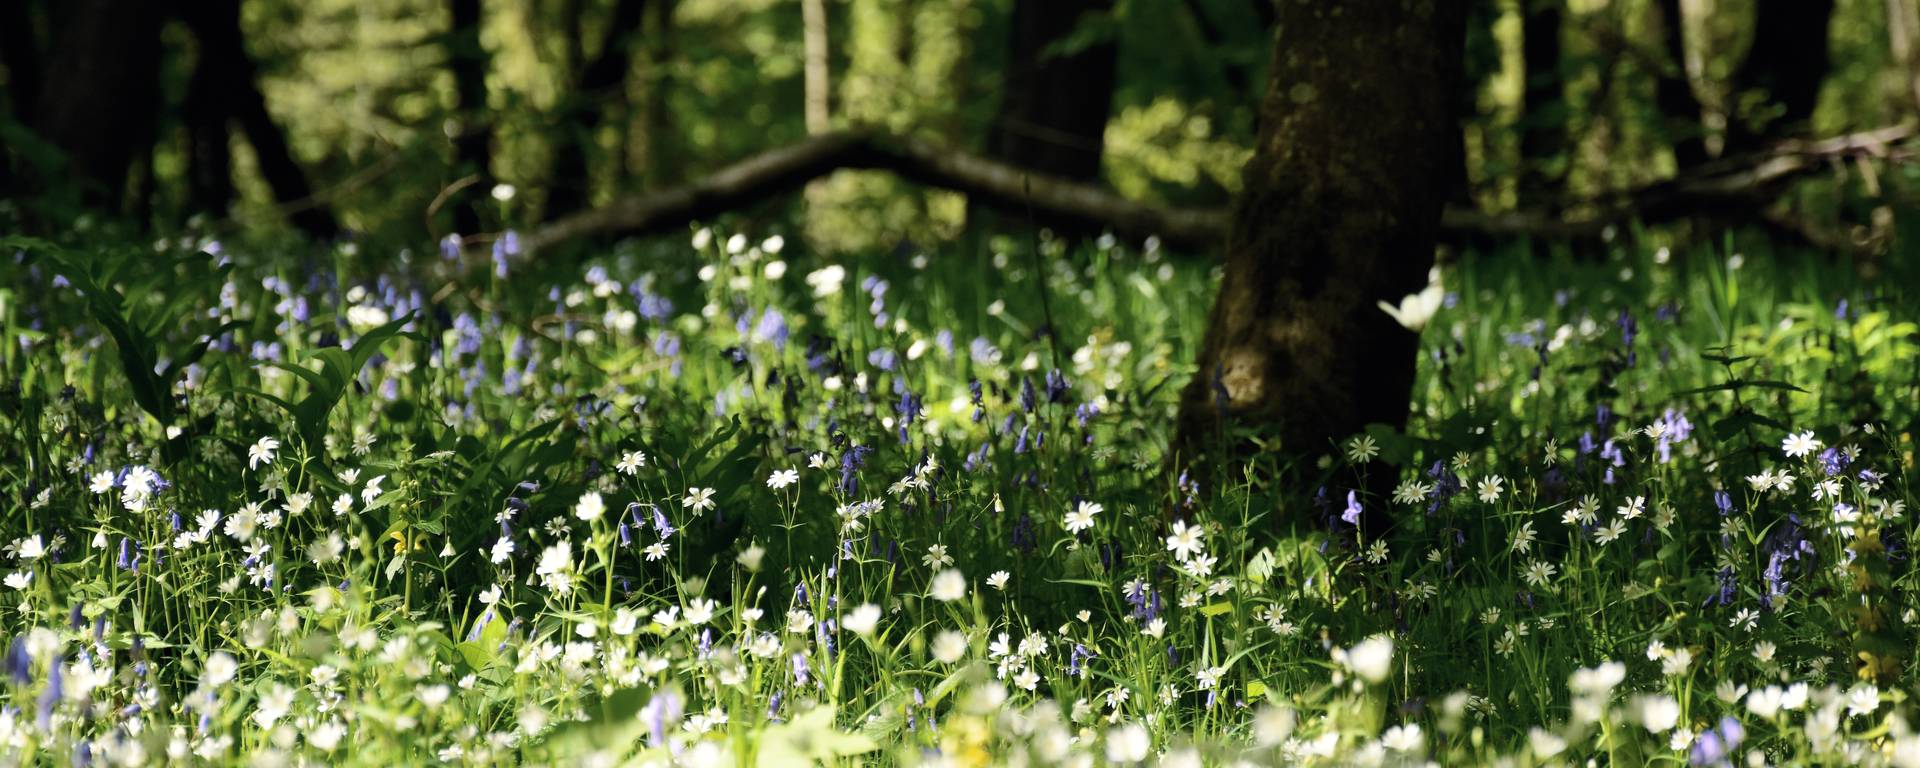 Forest of Hardelot